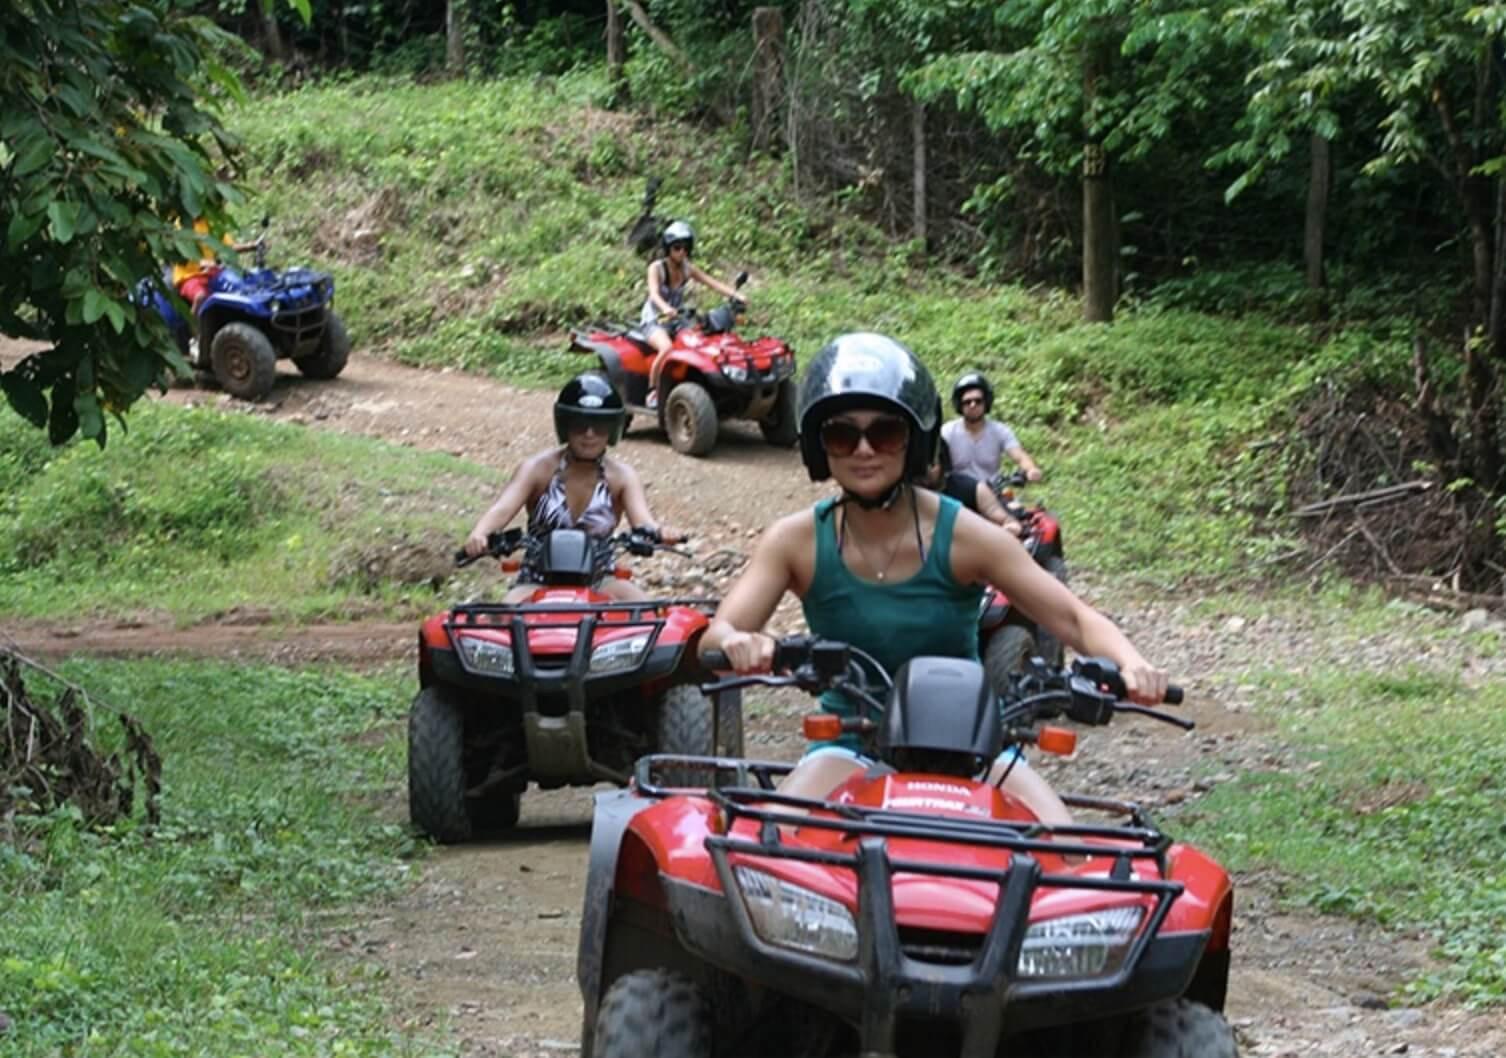 Tamarindo Guanacaste ATV adventure tour group riding along forst trail